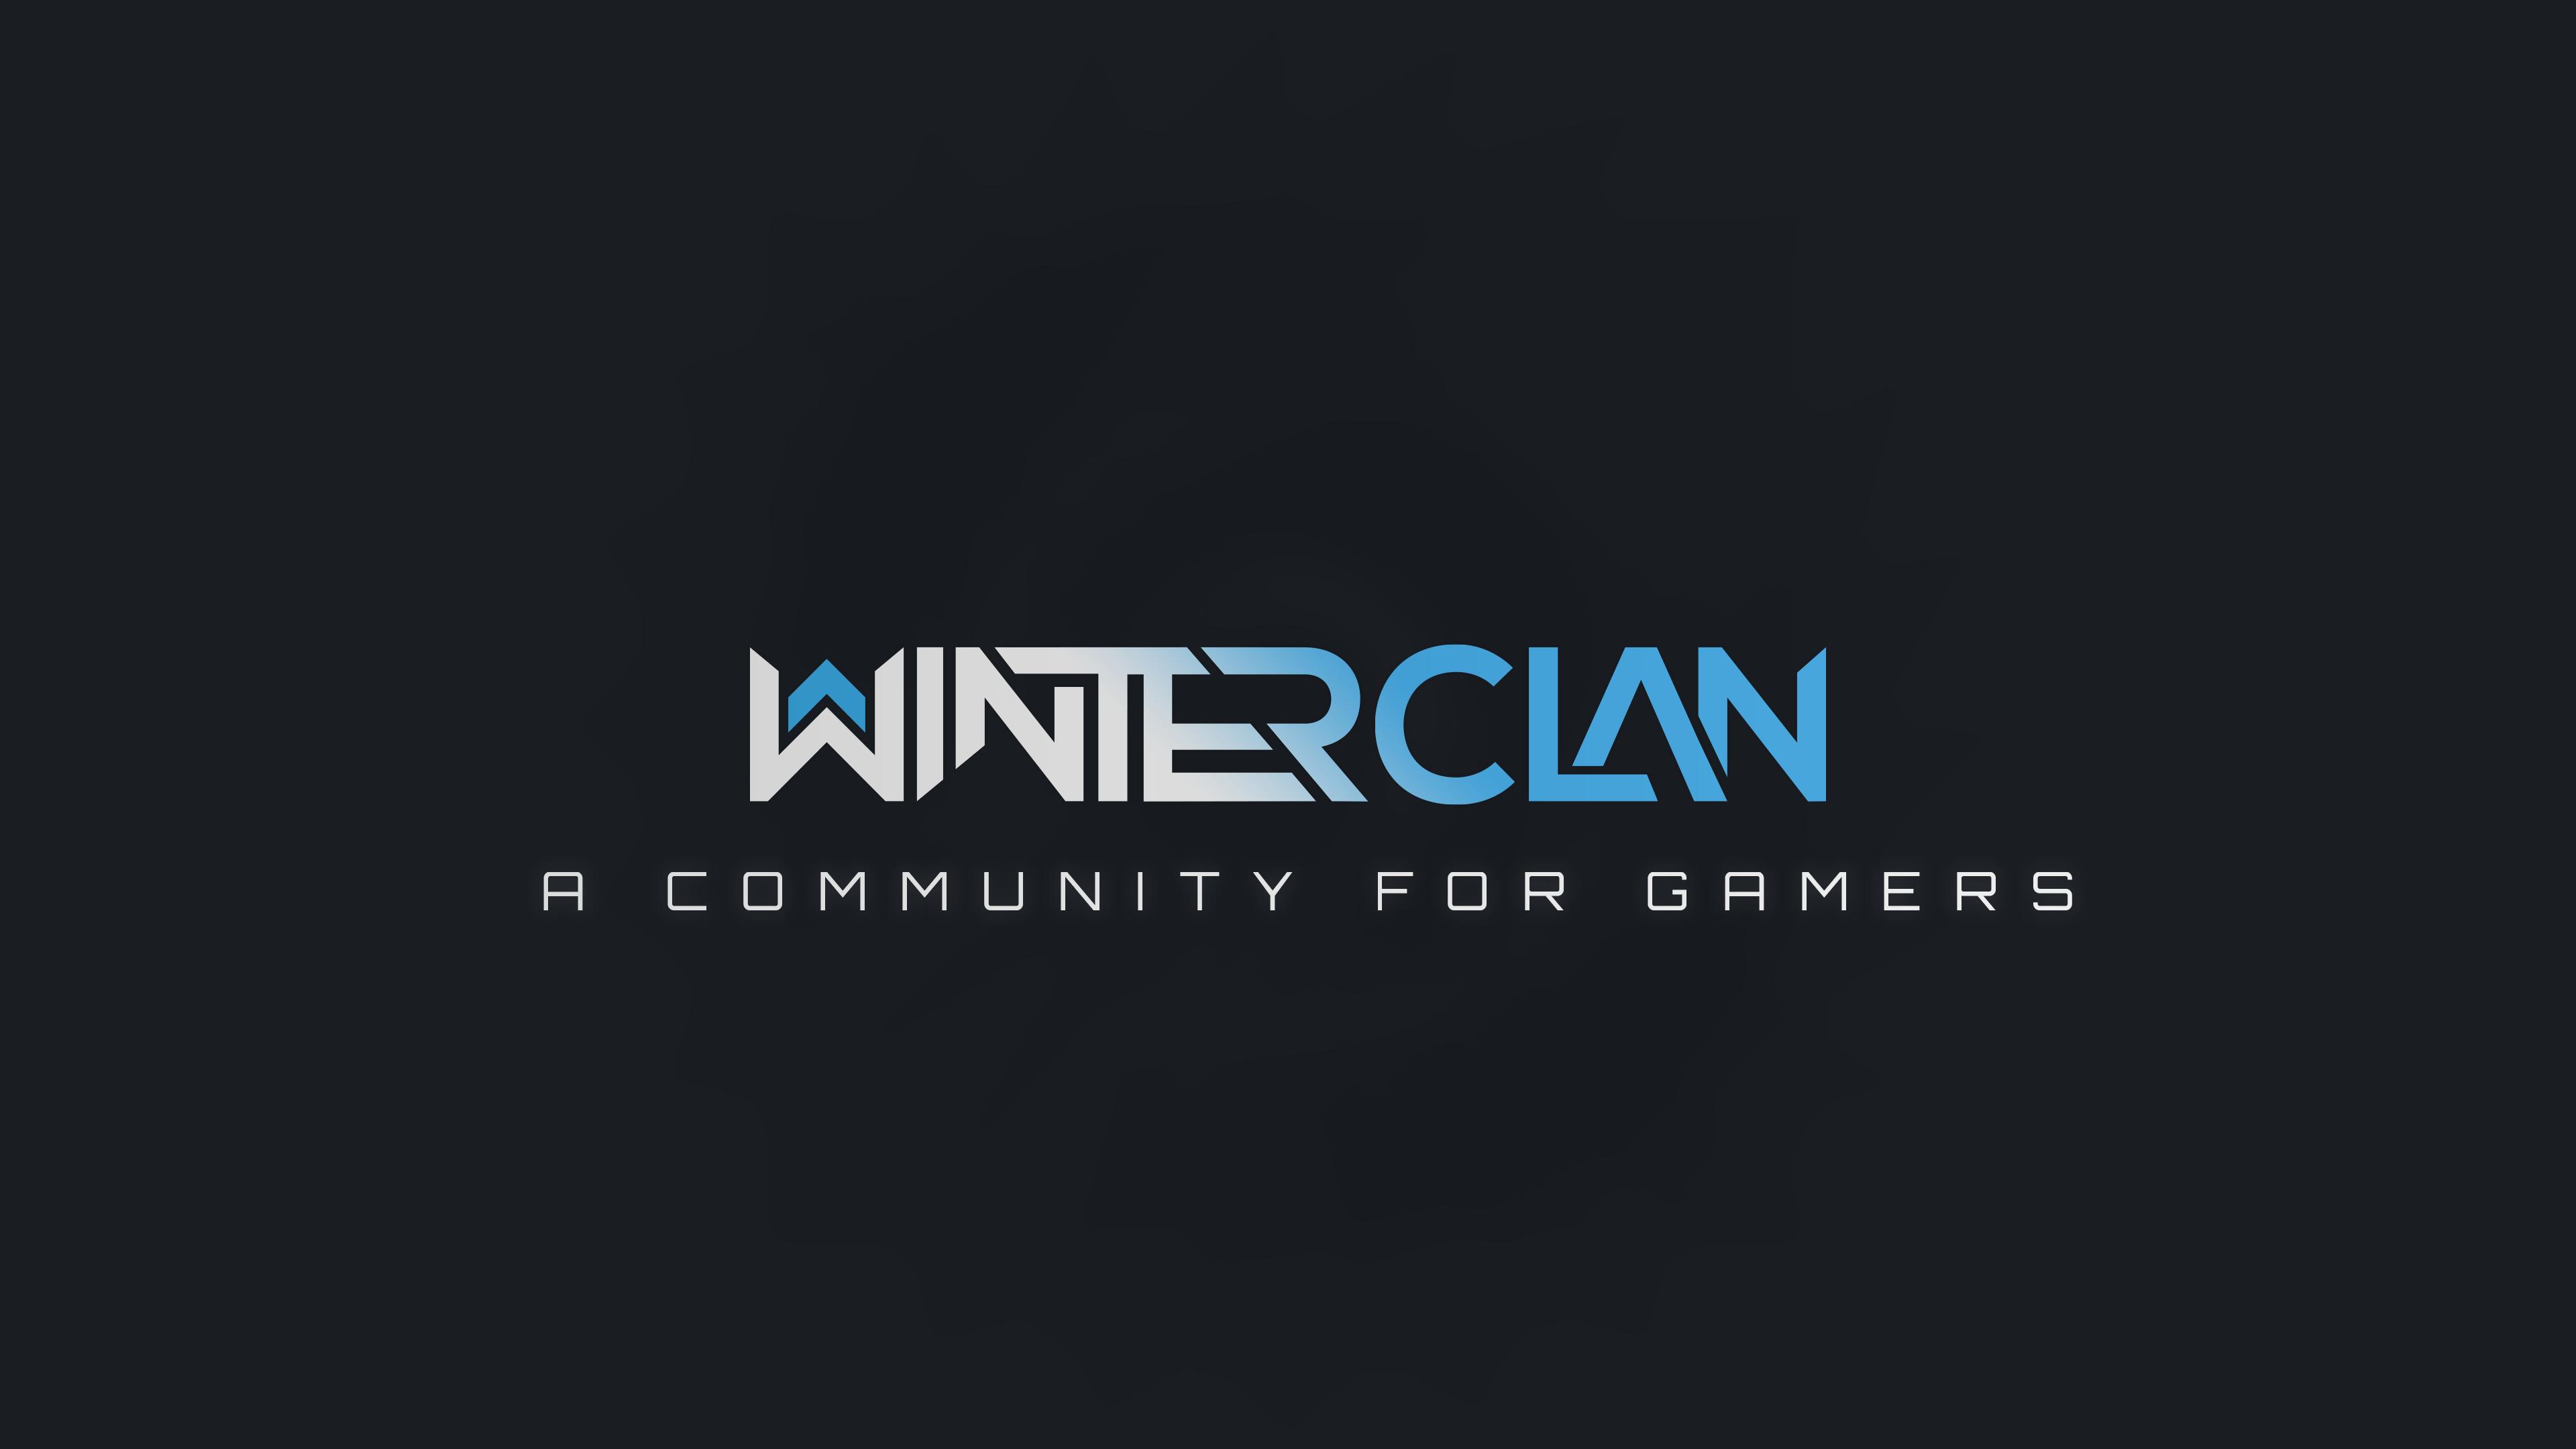 wallpaper-4k-winterclan-community2-dark-